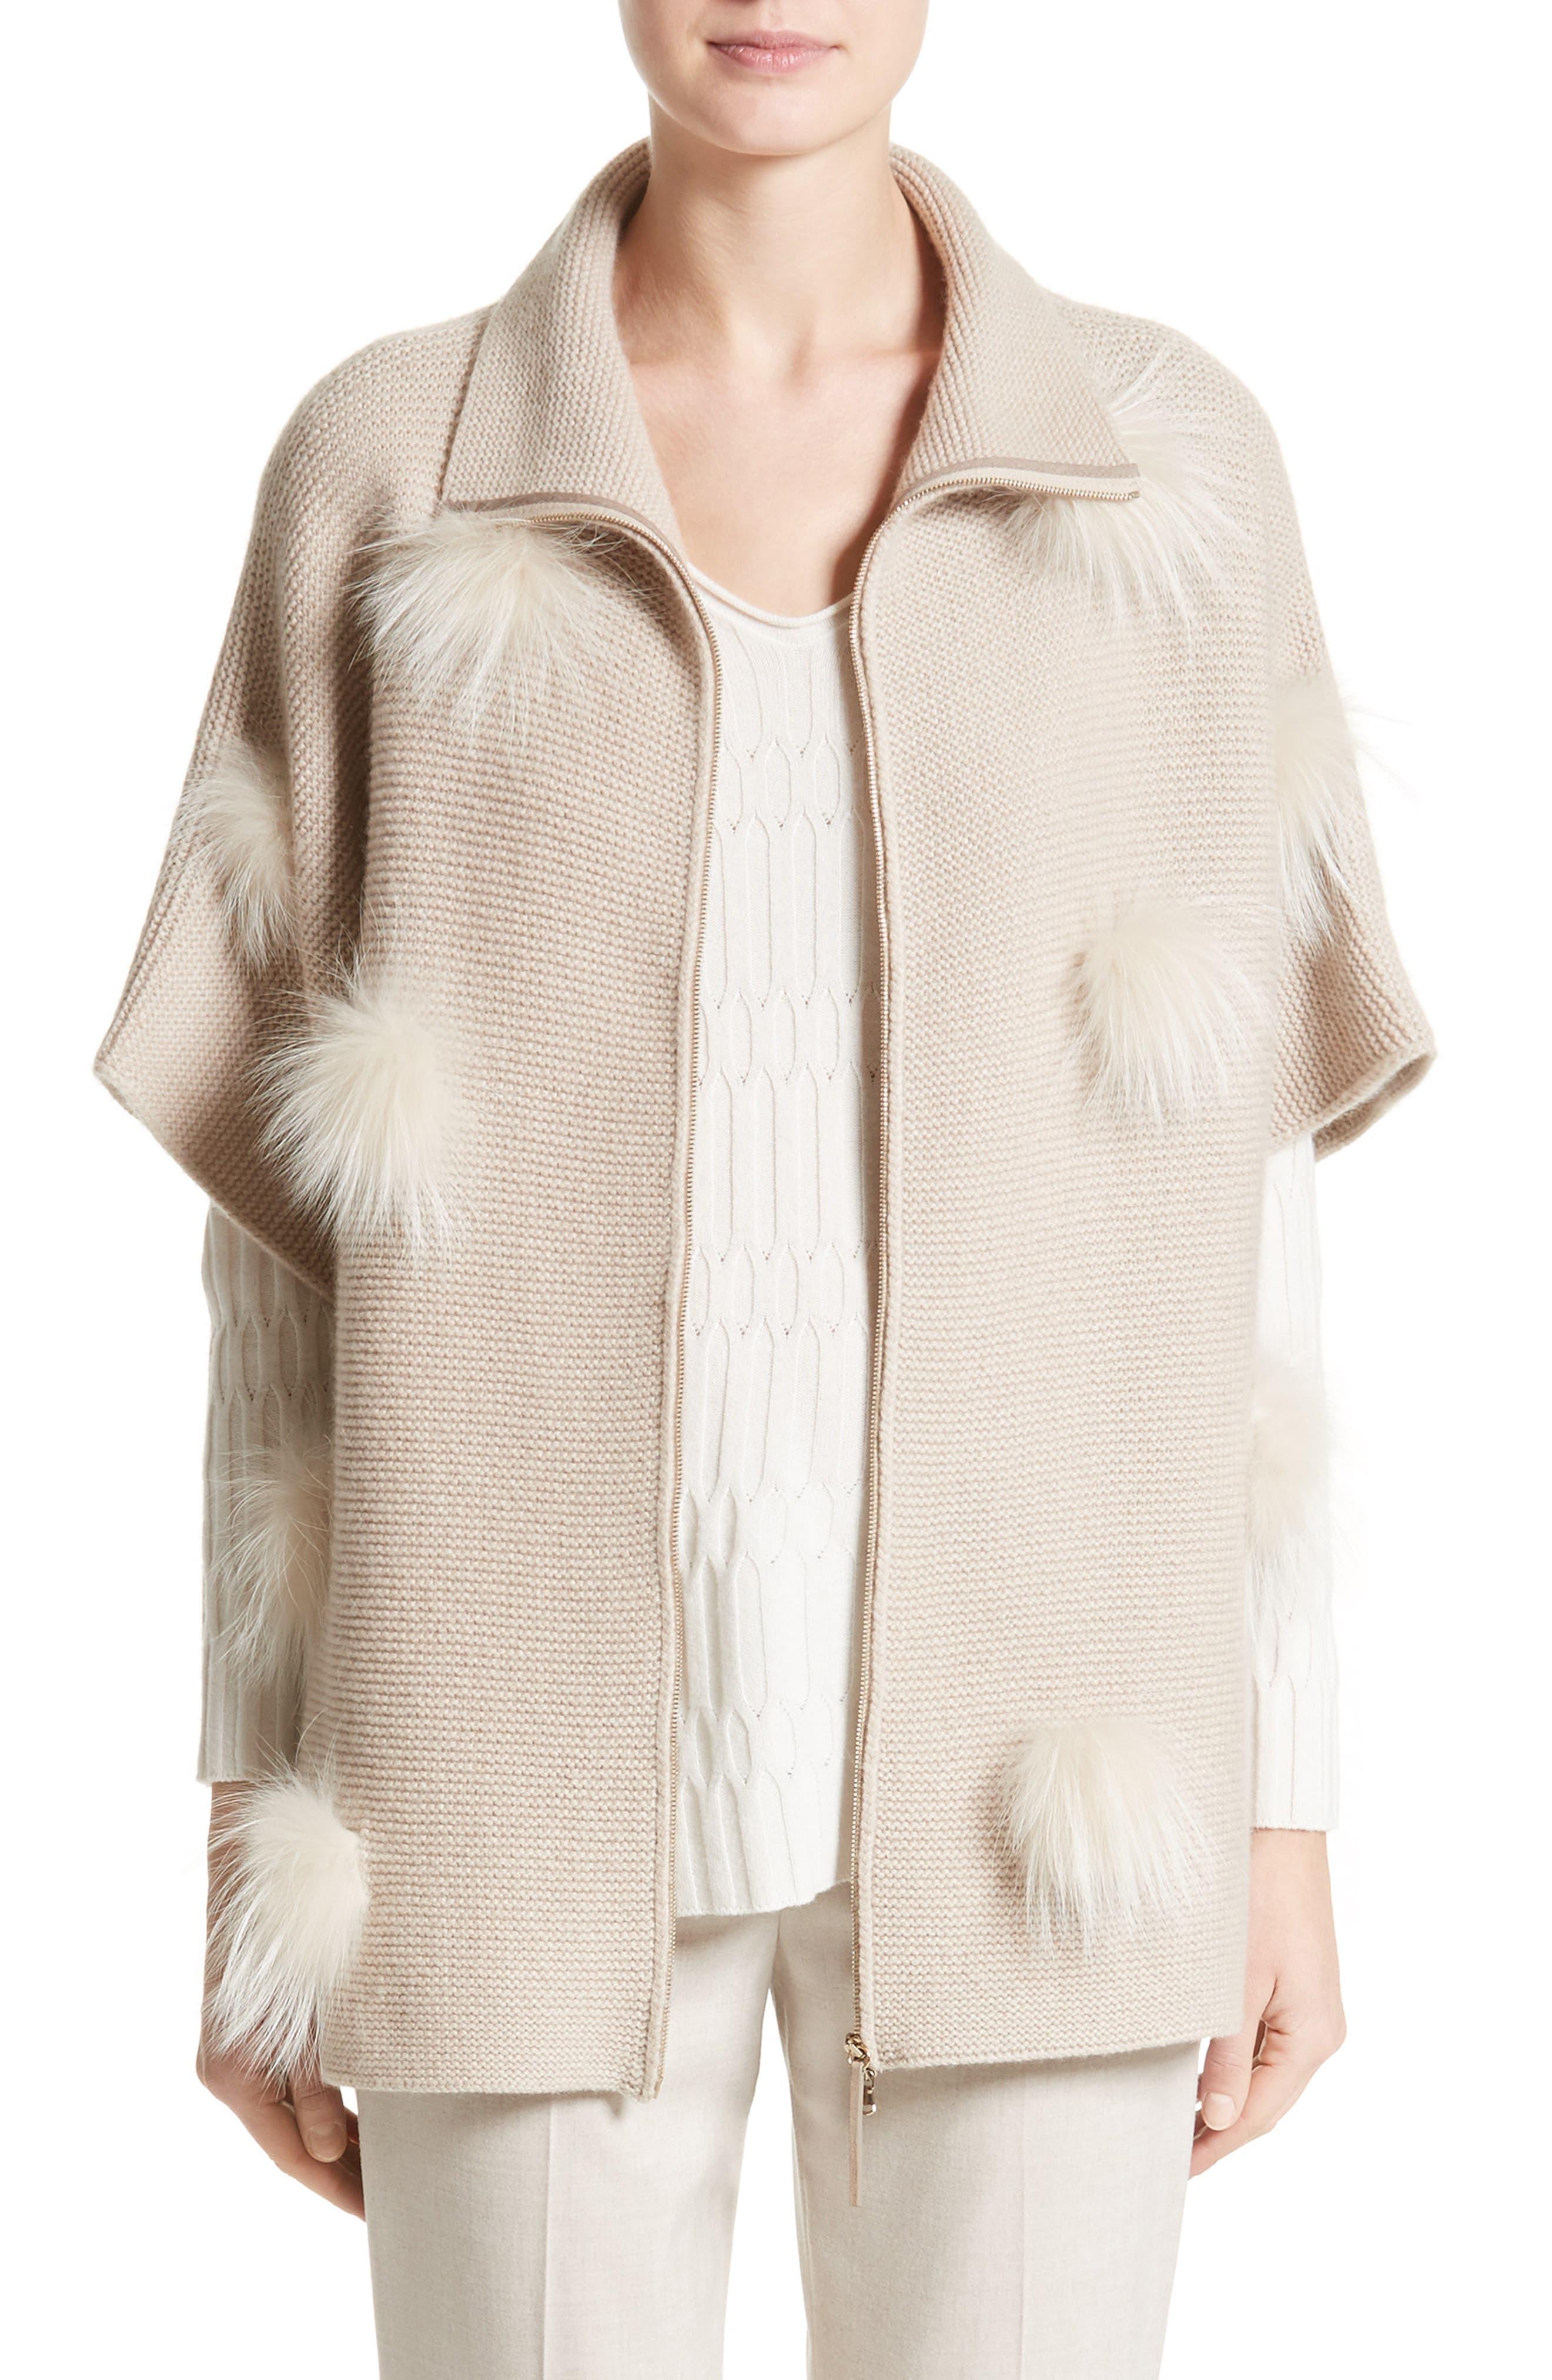 Alternate Image 1 Selected - Fabiana Filippi Micro Braid Cashmere Zip Cardigan with Genuine Fox Fur Trim